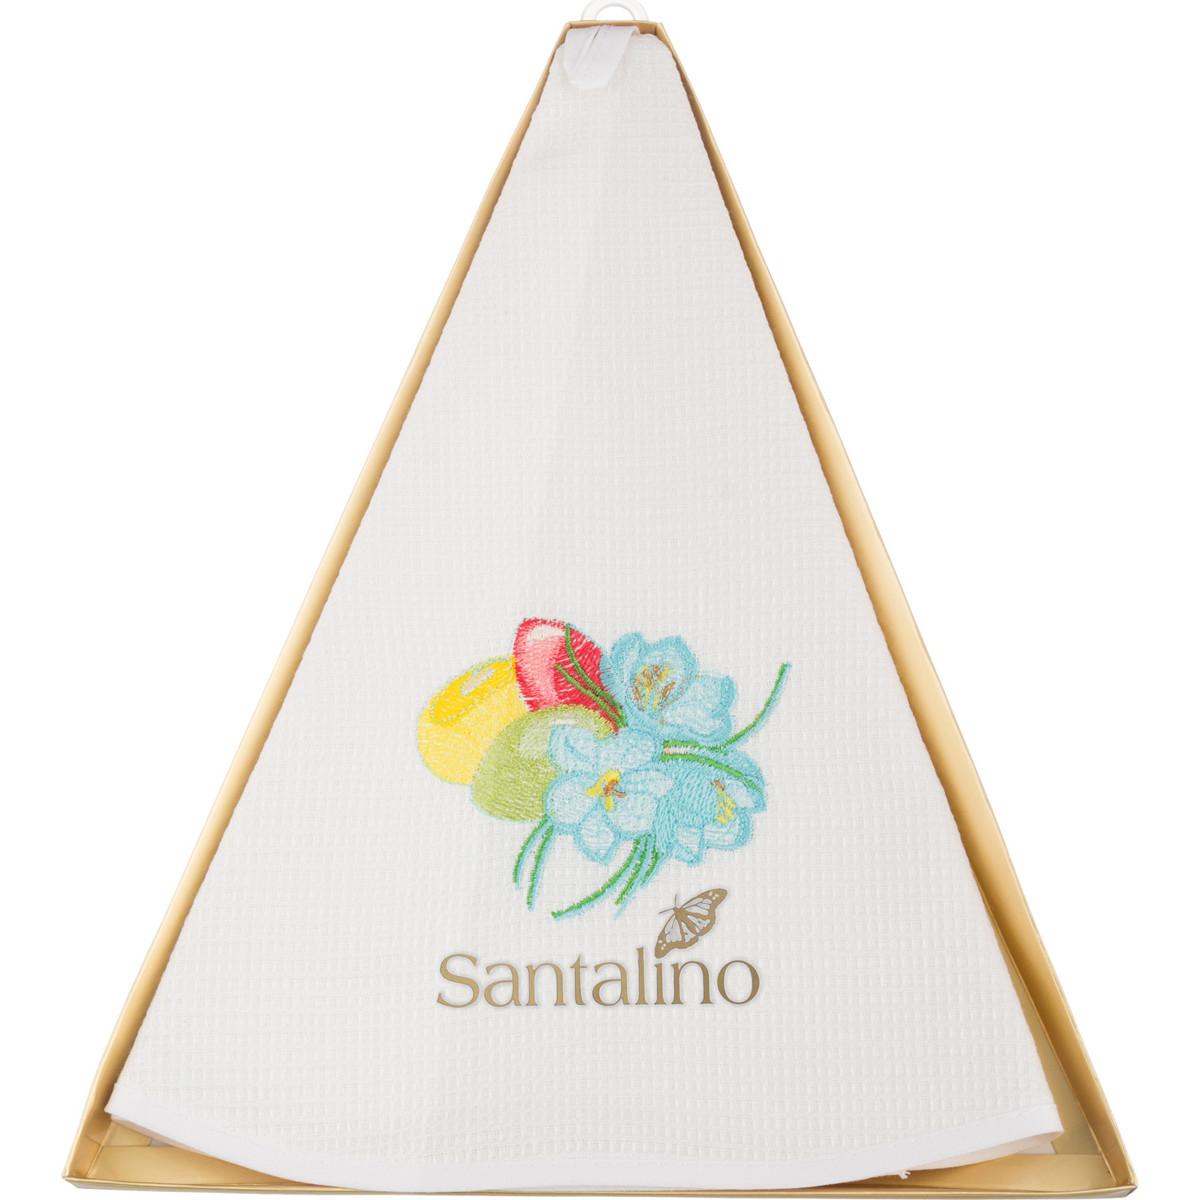 {} Santalino Кухонное полотенце Clifford (круглая 70 см) santalino кухонное полотенце amey круглая 70 см